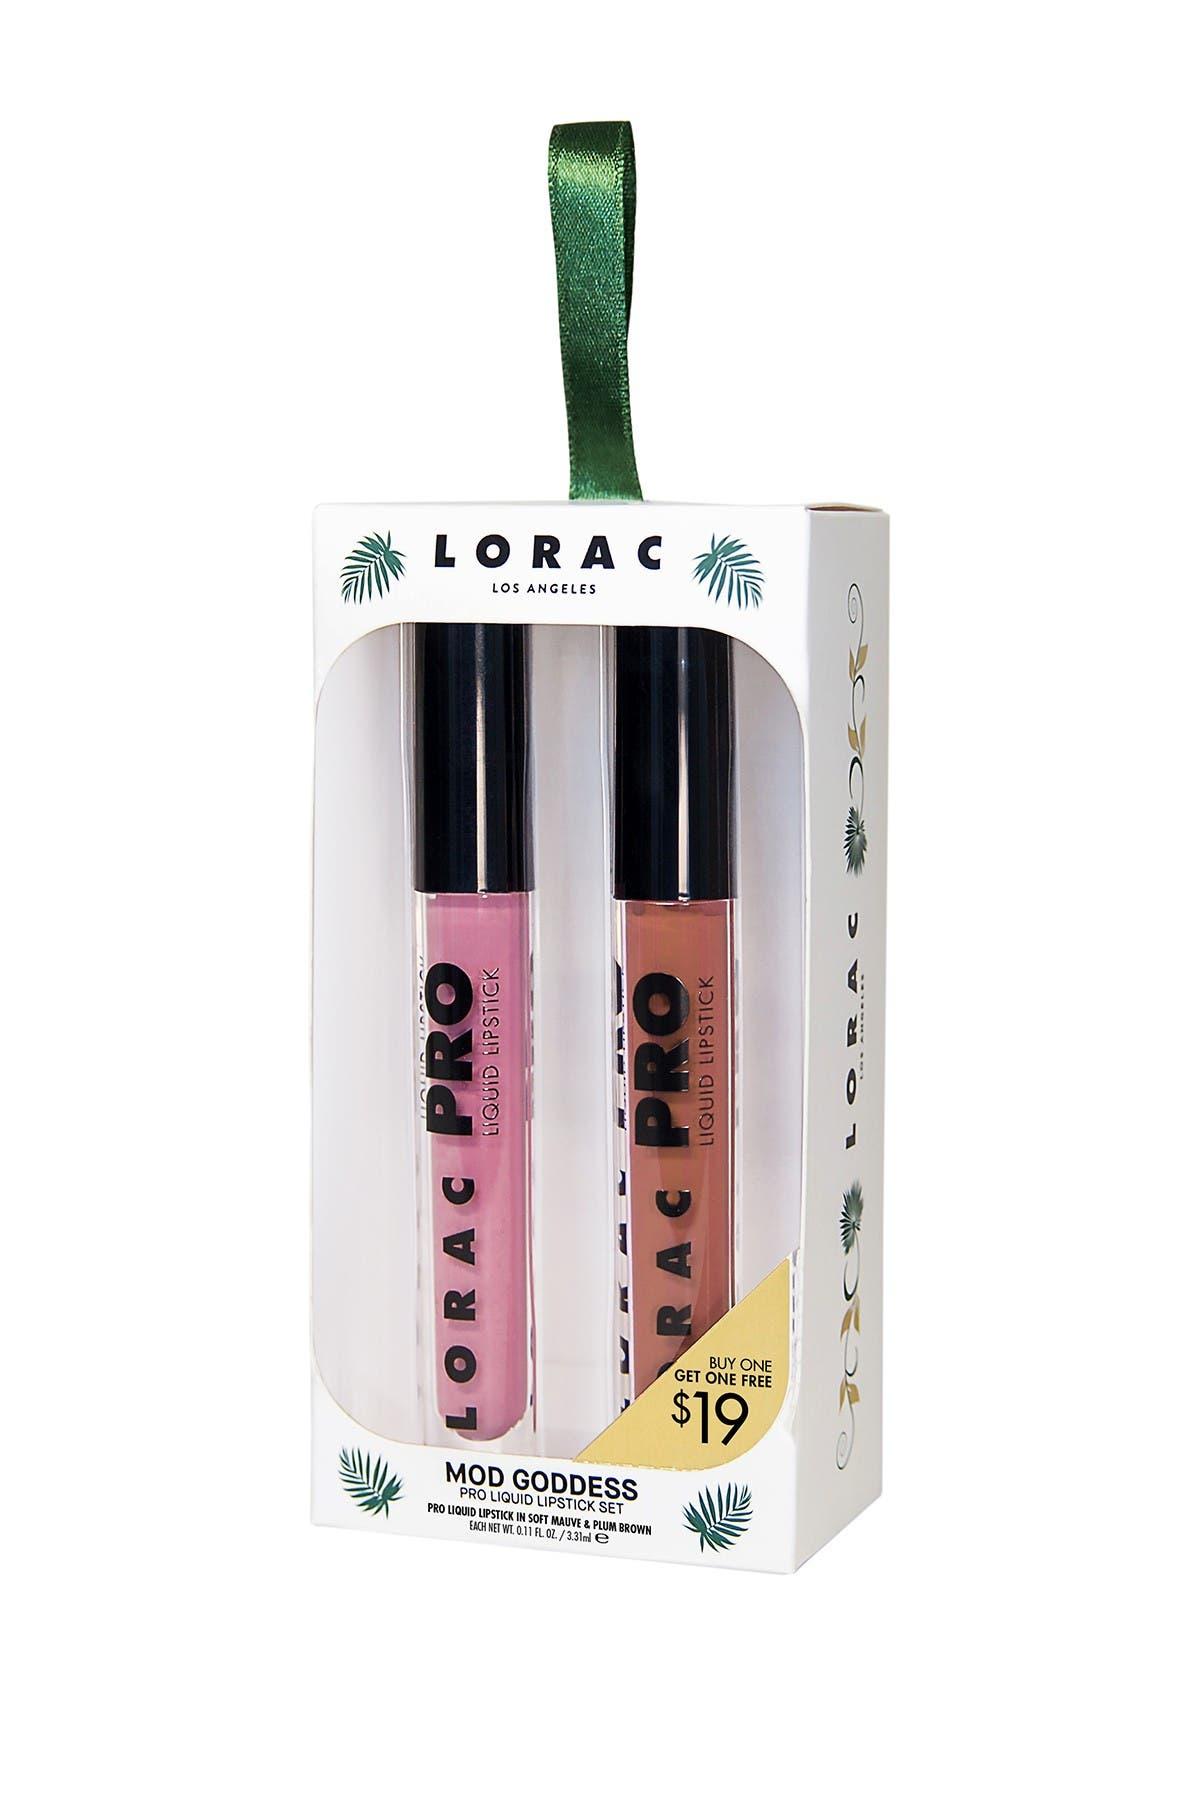 Image of LORAC Mod Goddess PRO Liquid Lipstick Set